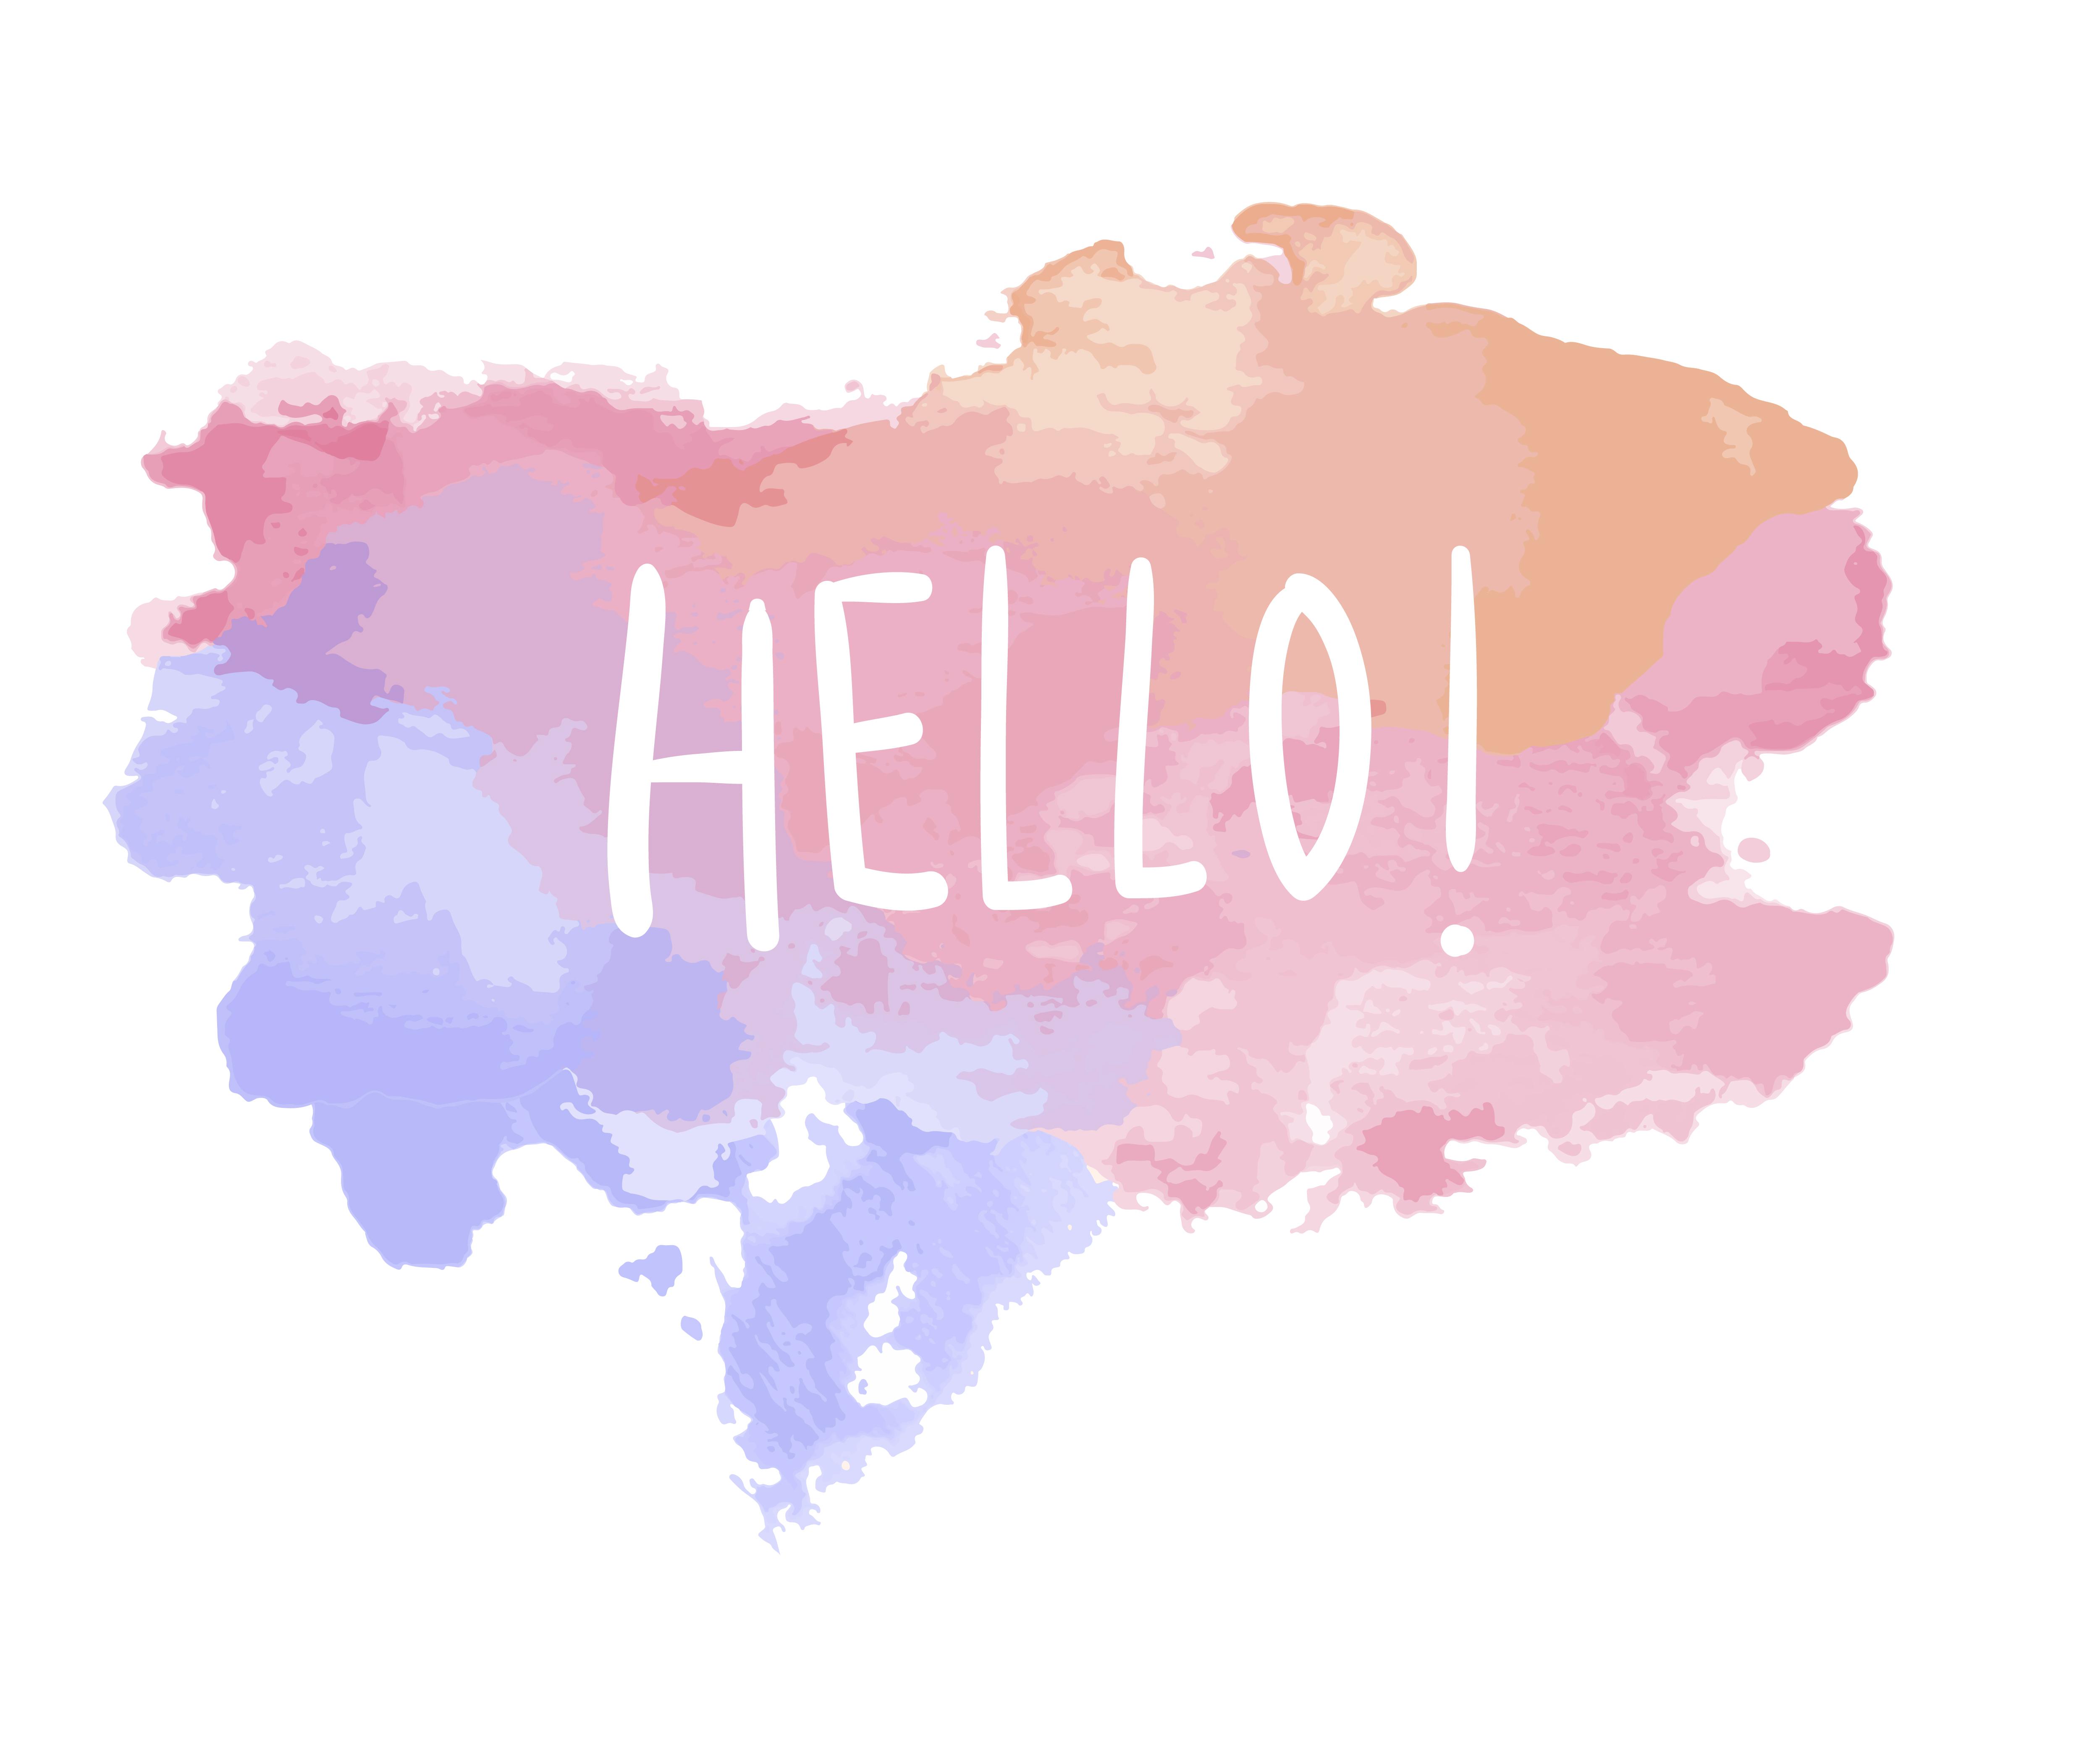 The word hello on a watercolor vector Download Free Vectors Clipart Graphics & Vector Art